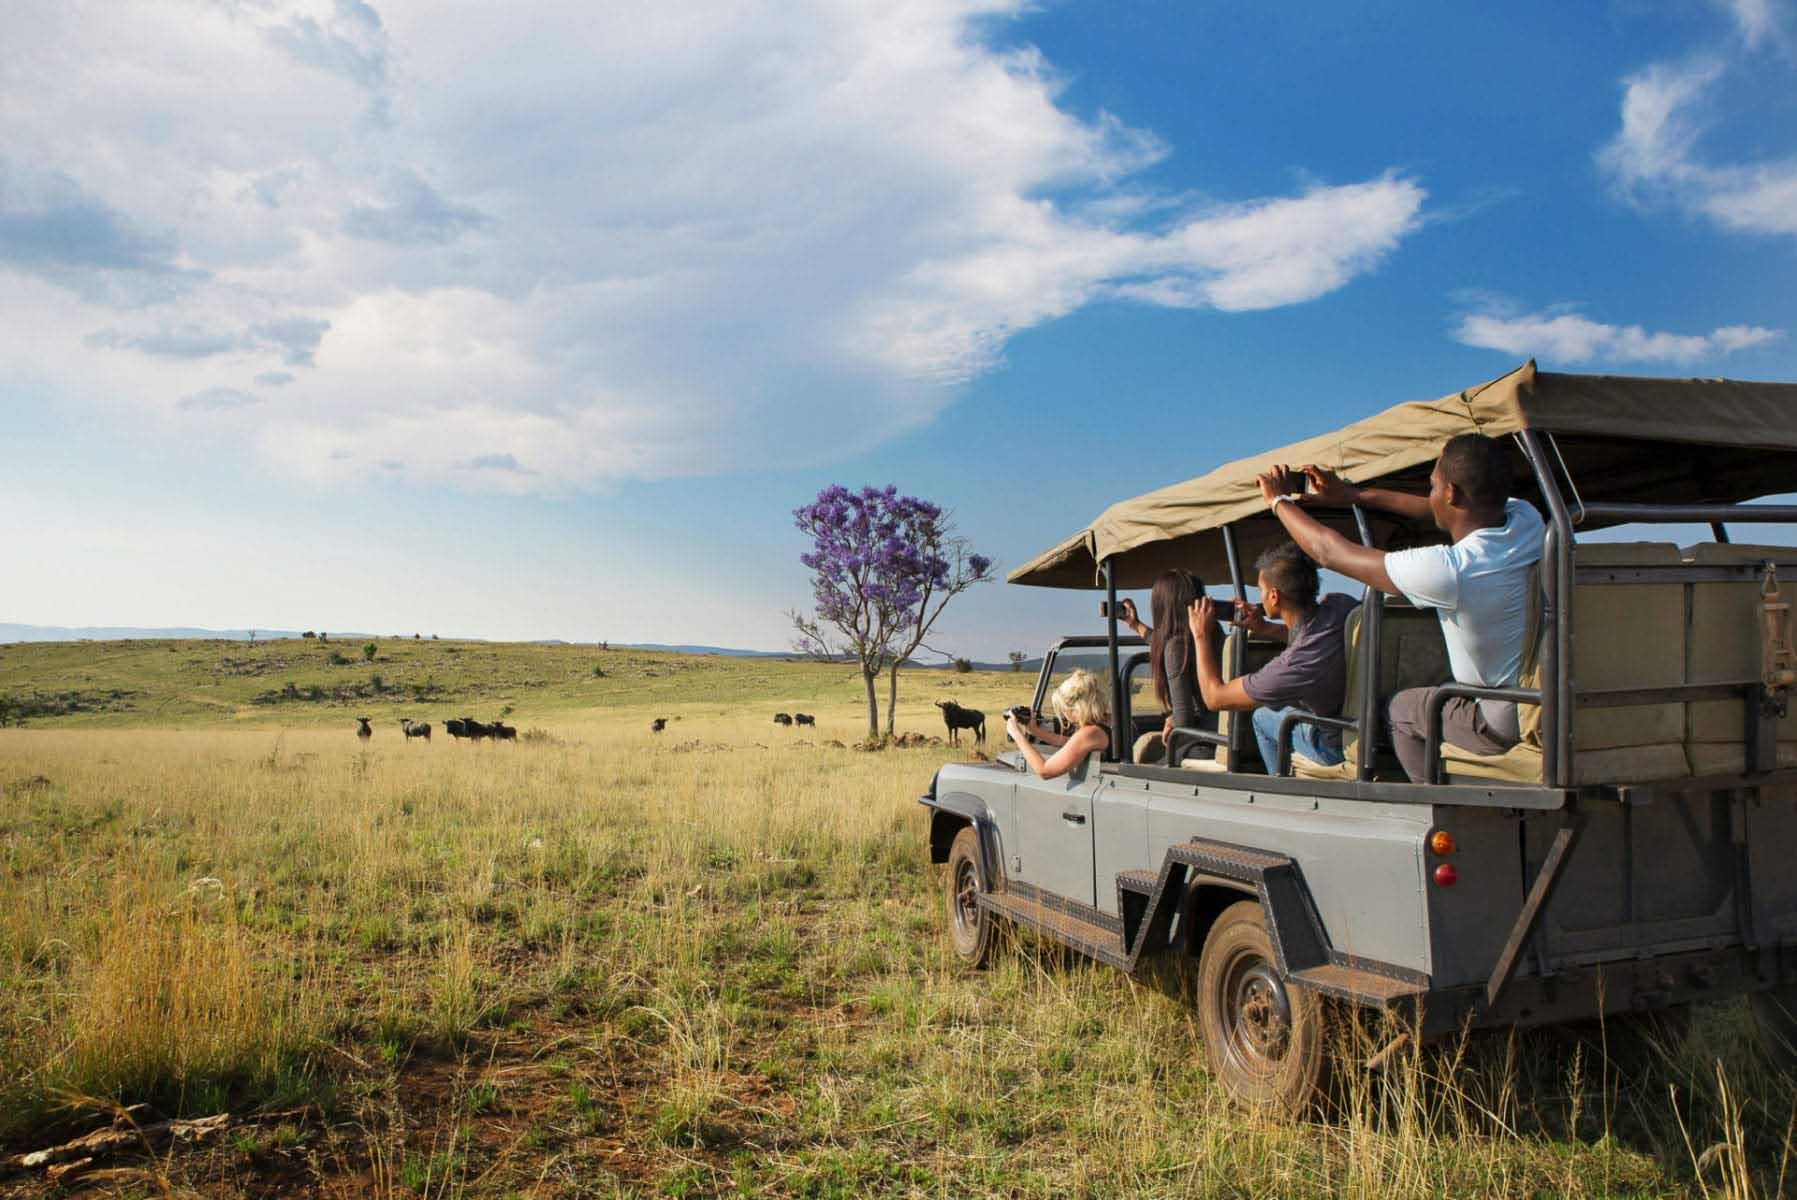 safari i närheten av Johannesburg